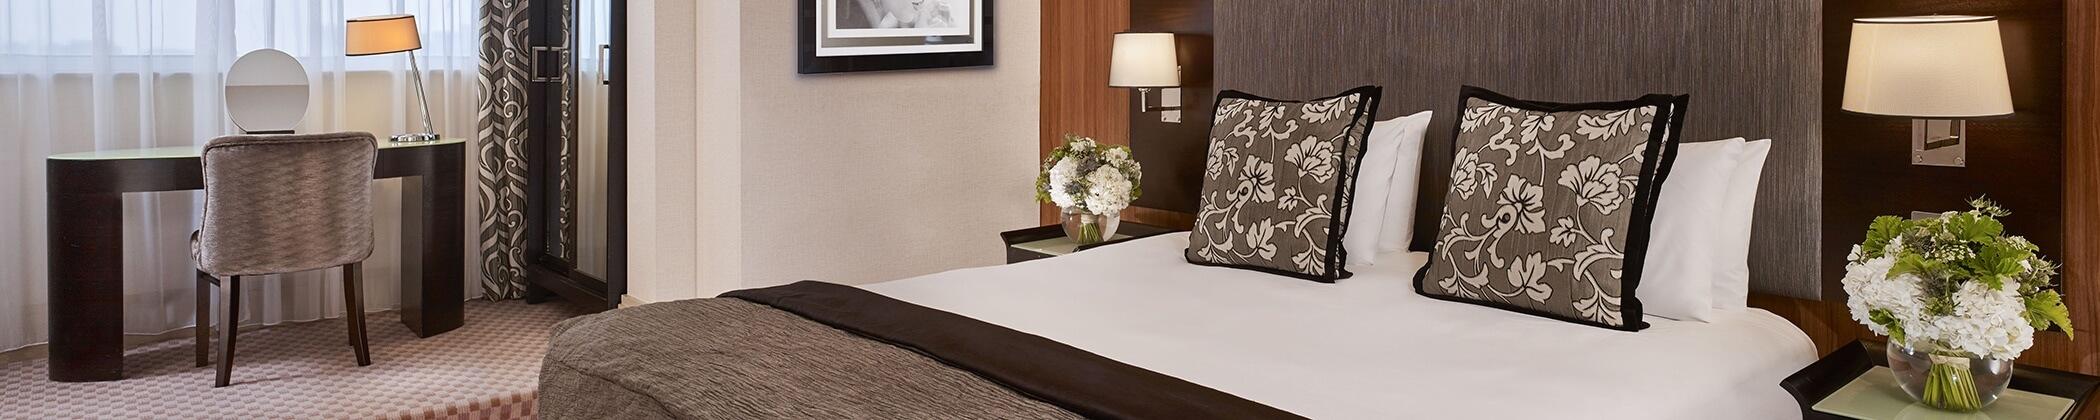 Cavendish London Hotel